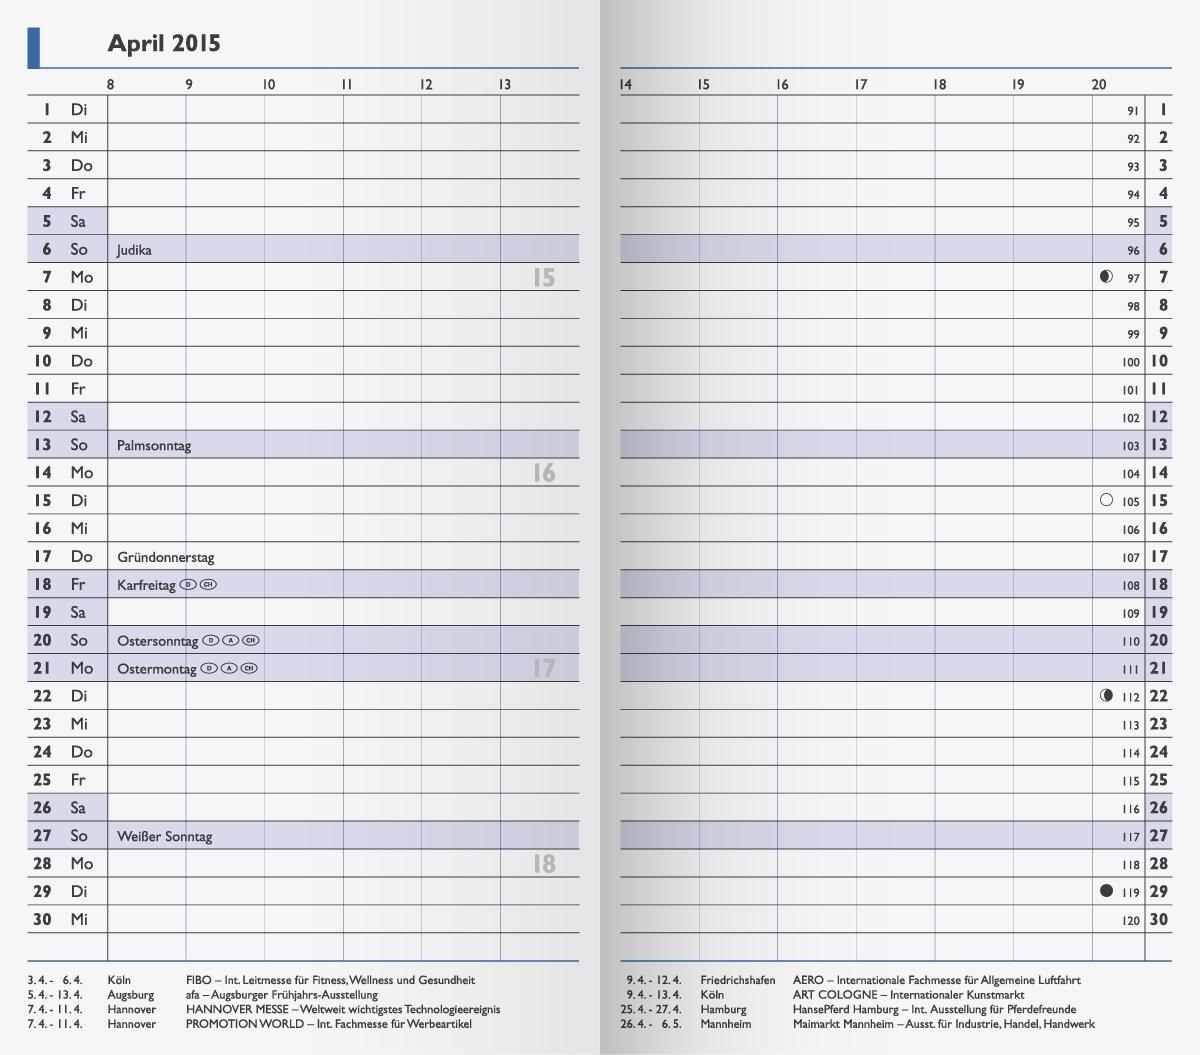 Brunnen Ersatz-Faltkalender 8,7x15,3 cm gelb 2021